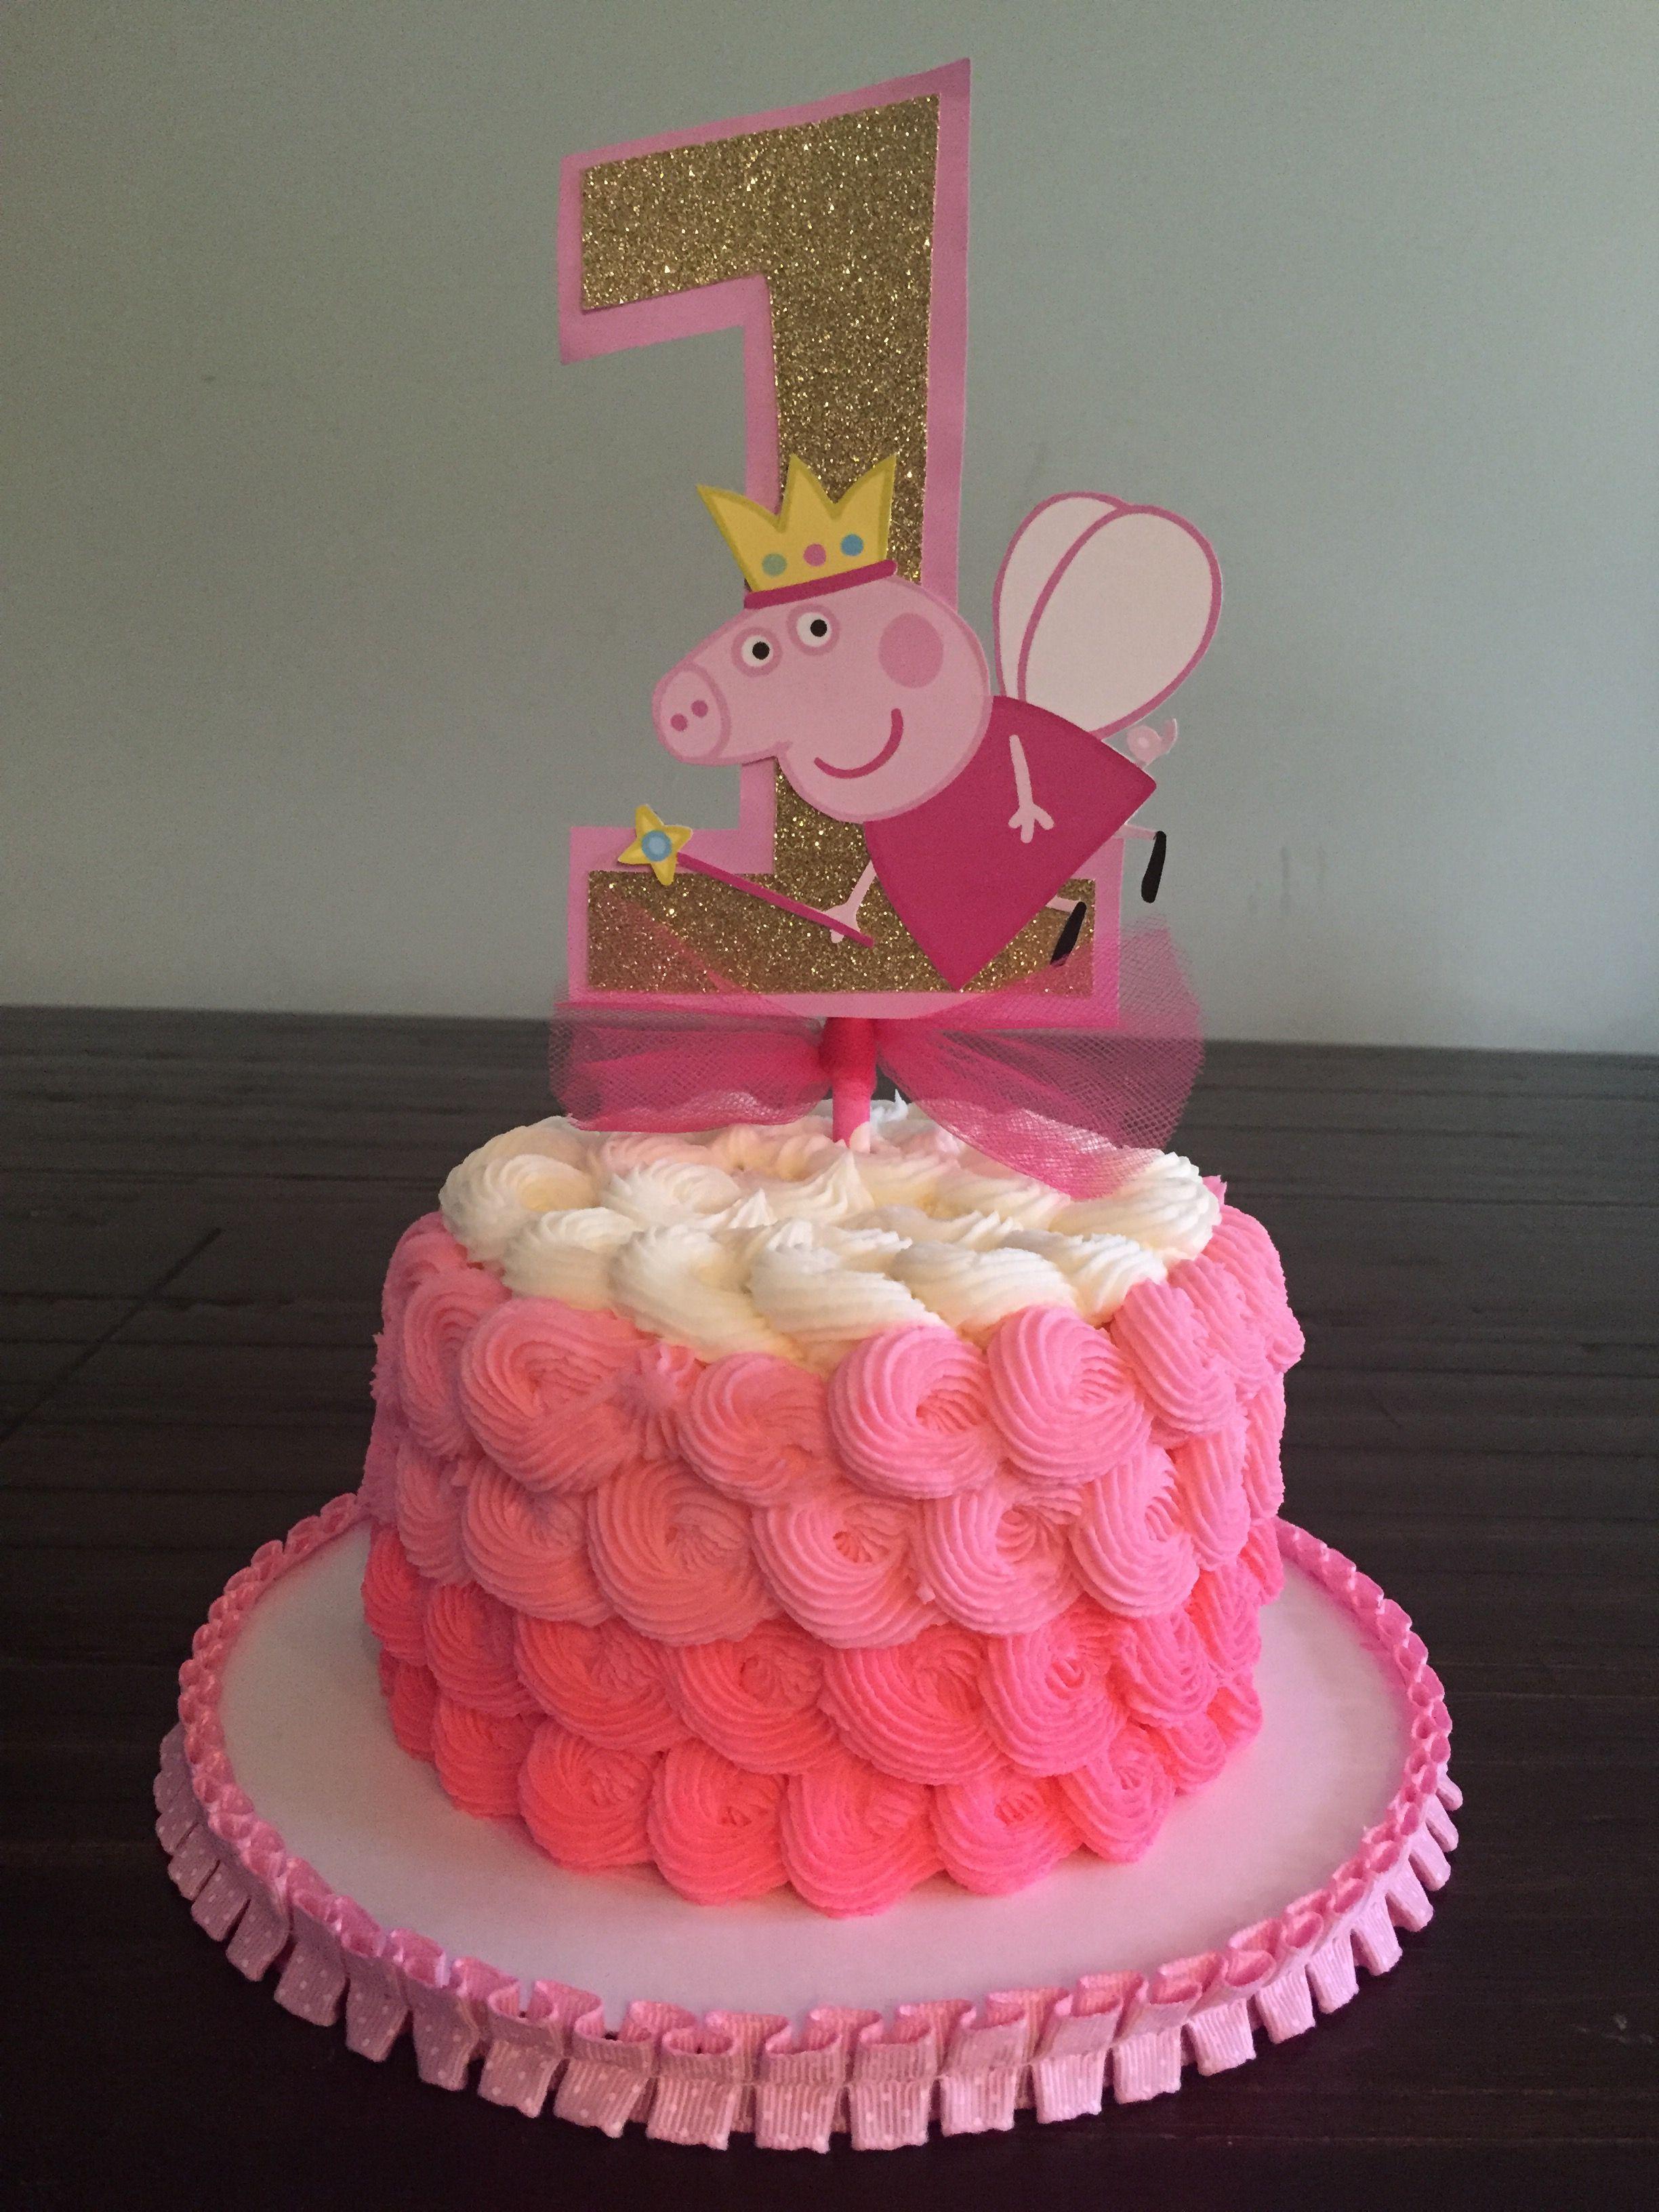 Peppa Pig Smash Cake Peppa Pig Birthday Cake Pig Birthday Cakes